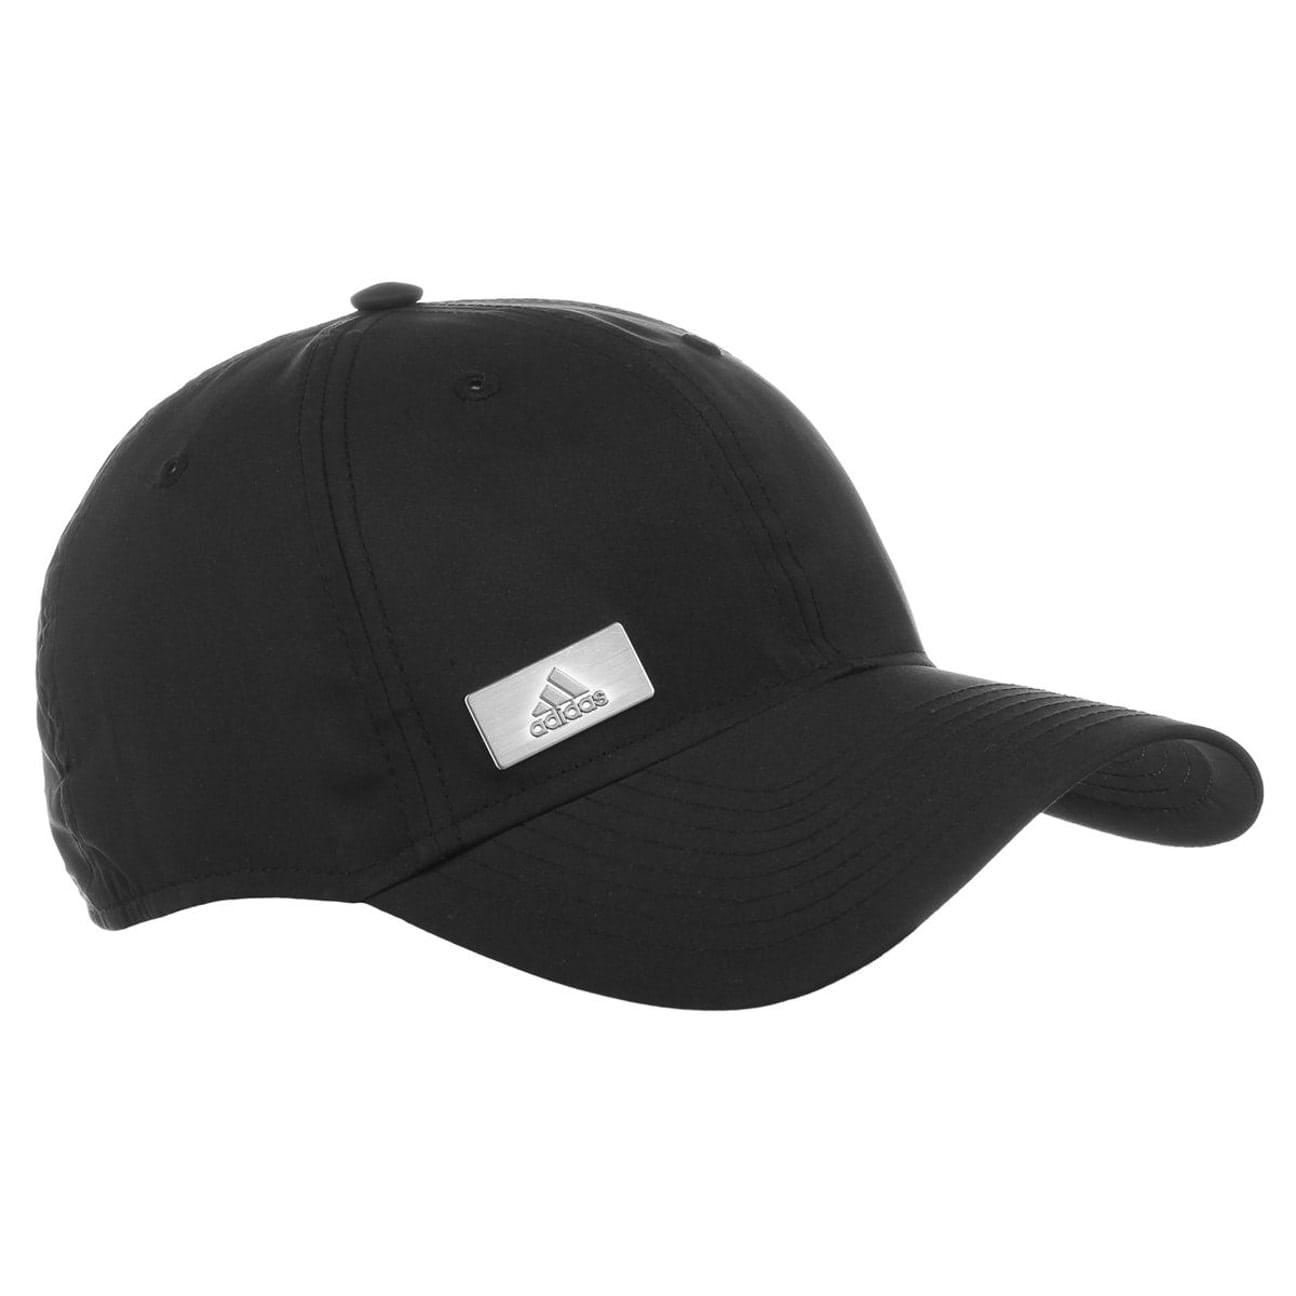 Gorra Metal Sports by adidas - Gorras - sombreroshop.es 113325a45c1